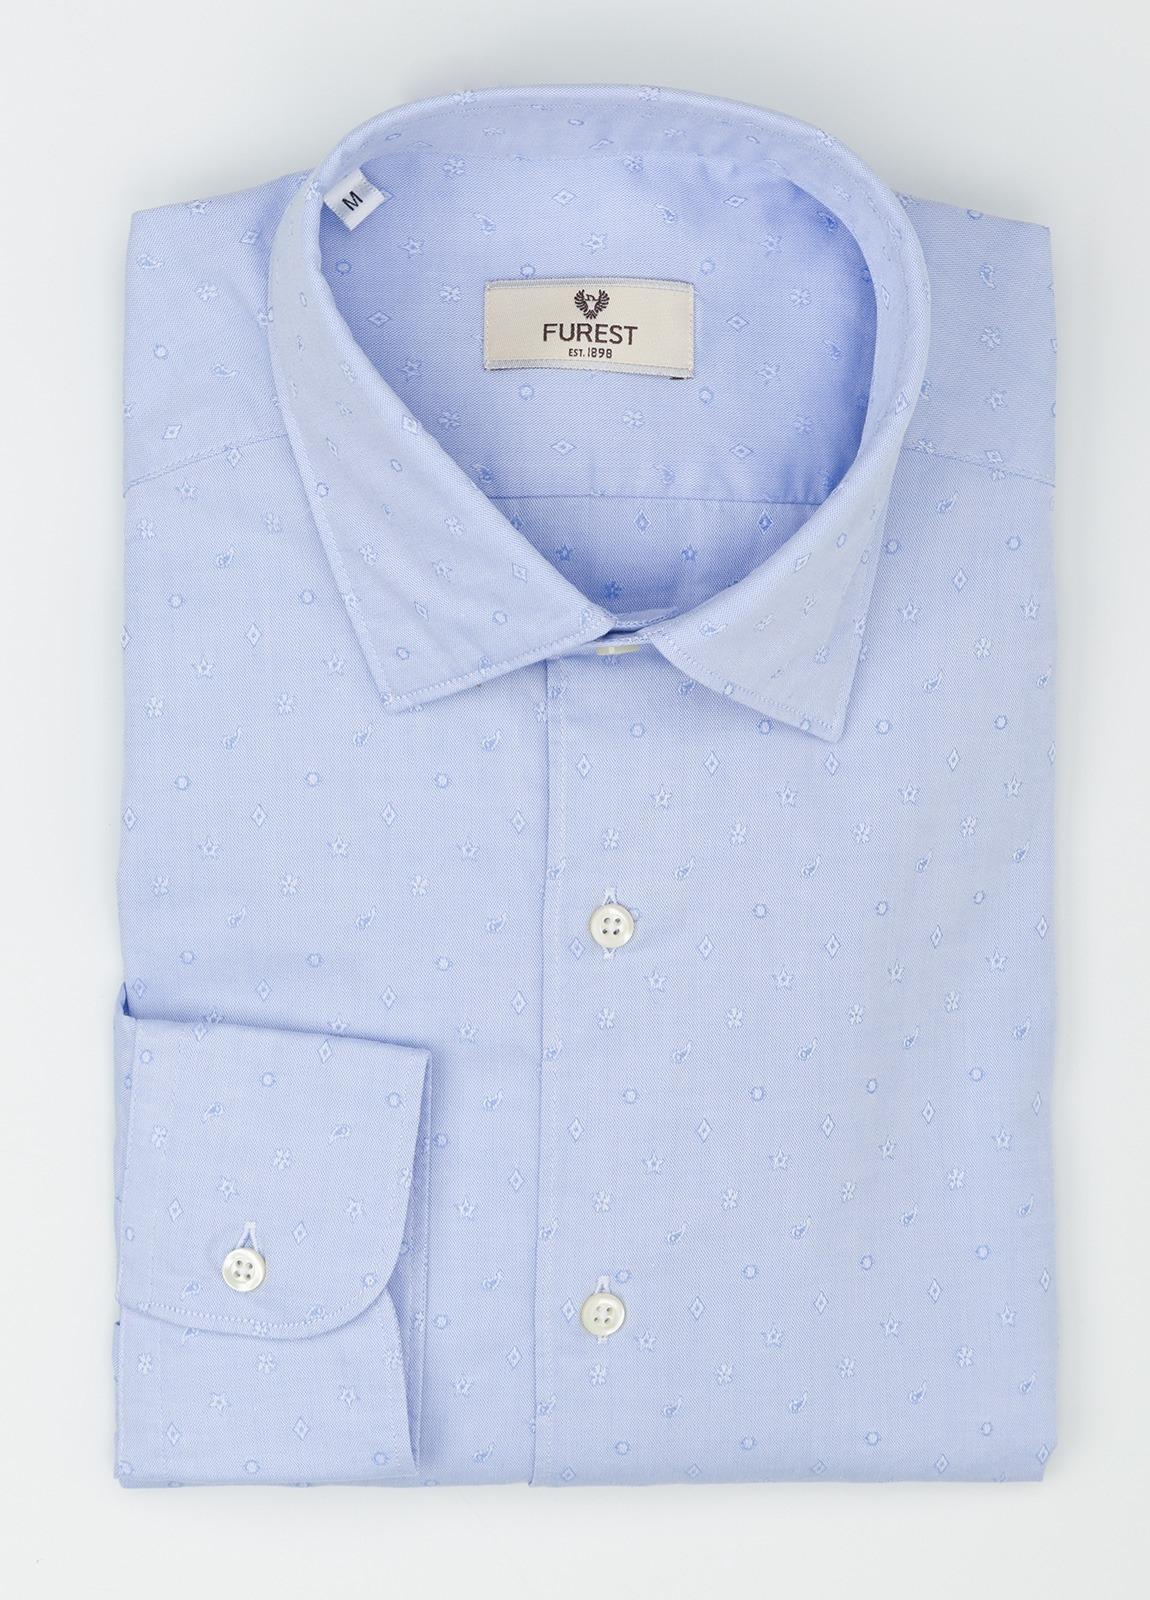 Camisa Leisure Wear REGULAR FIT modelo PORTO tejido dibujo jacquard color celeste. 100% Algodón. - Ítem4